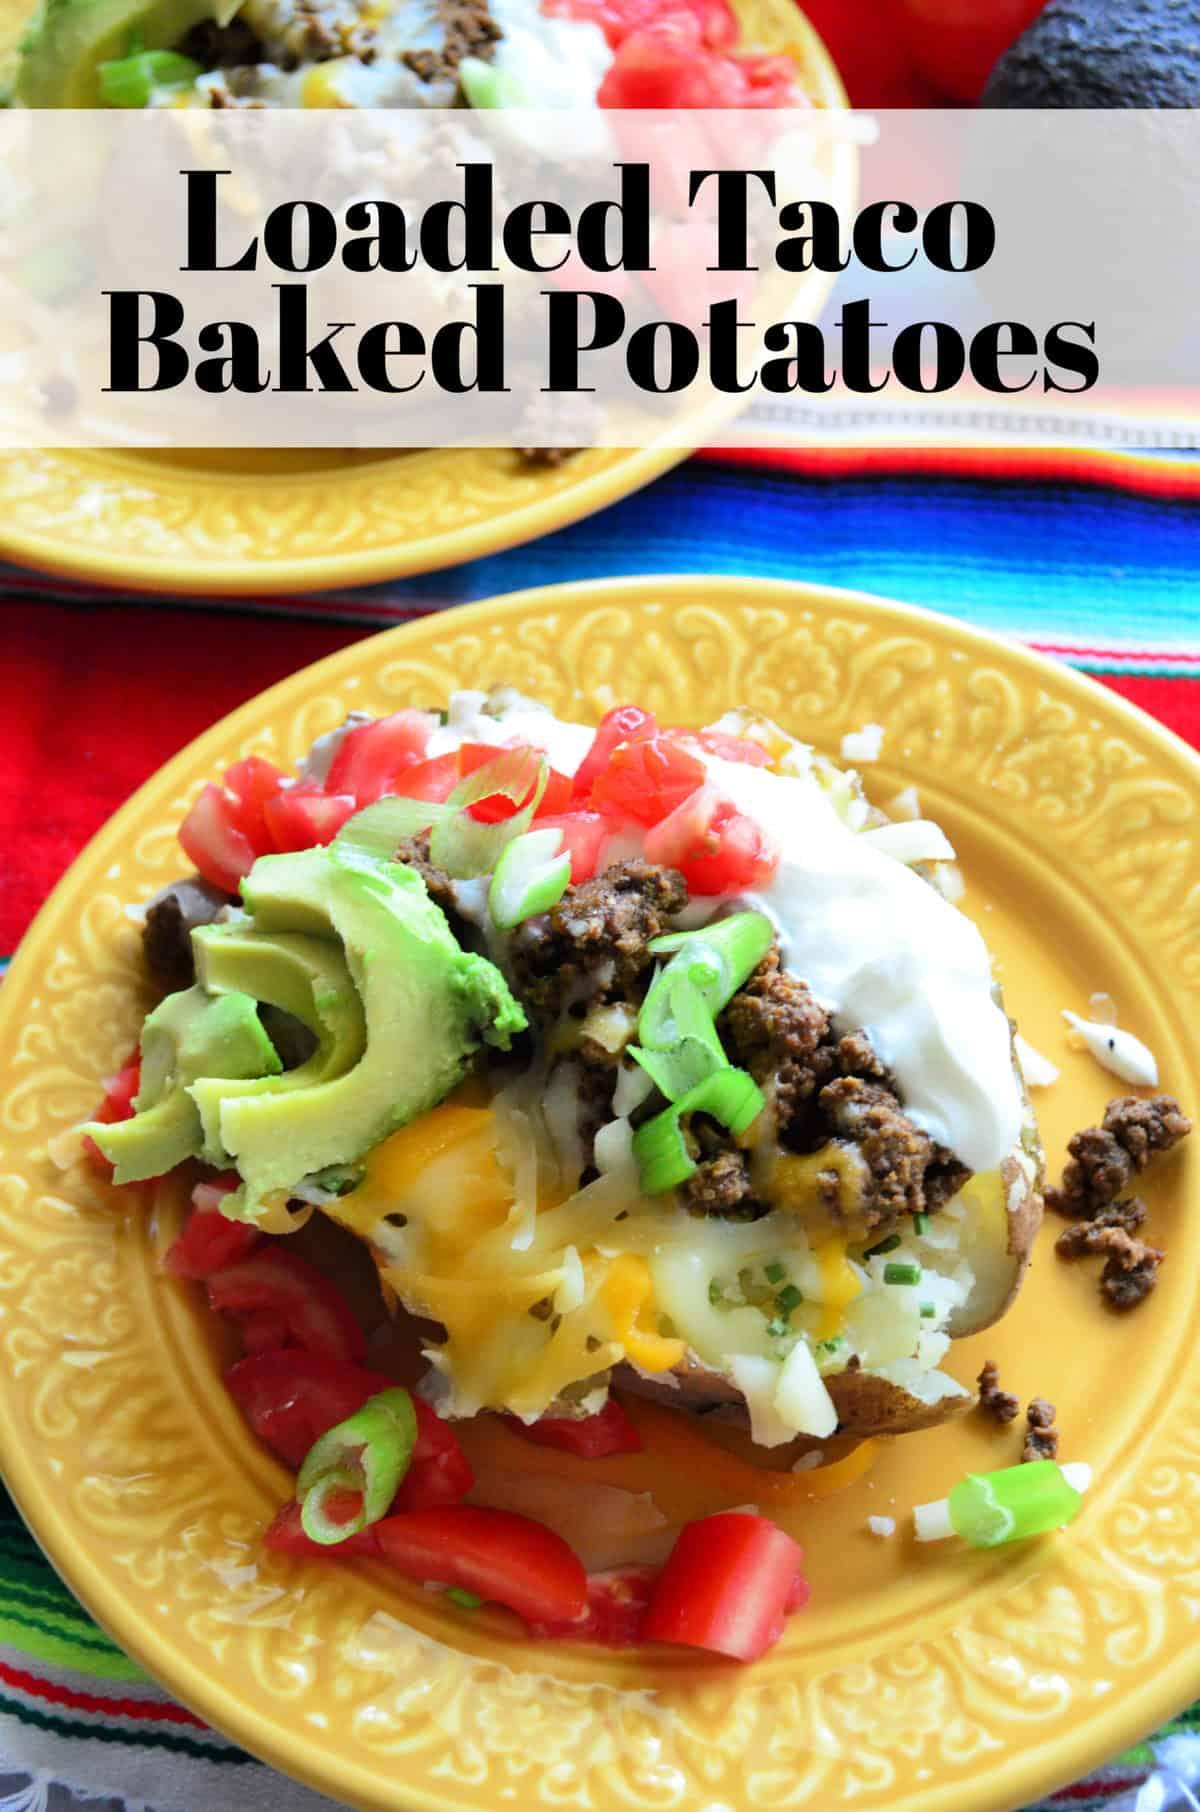 Loaded Taco Baked Potatoes